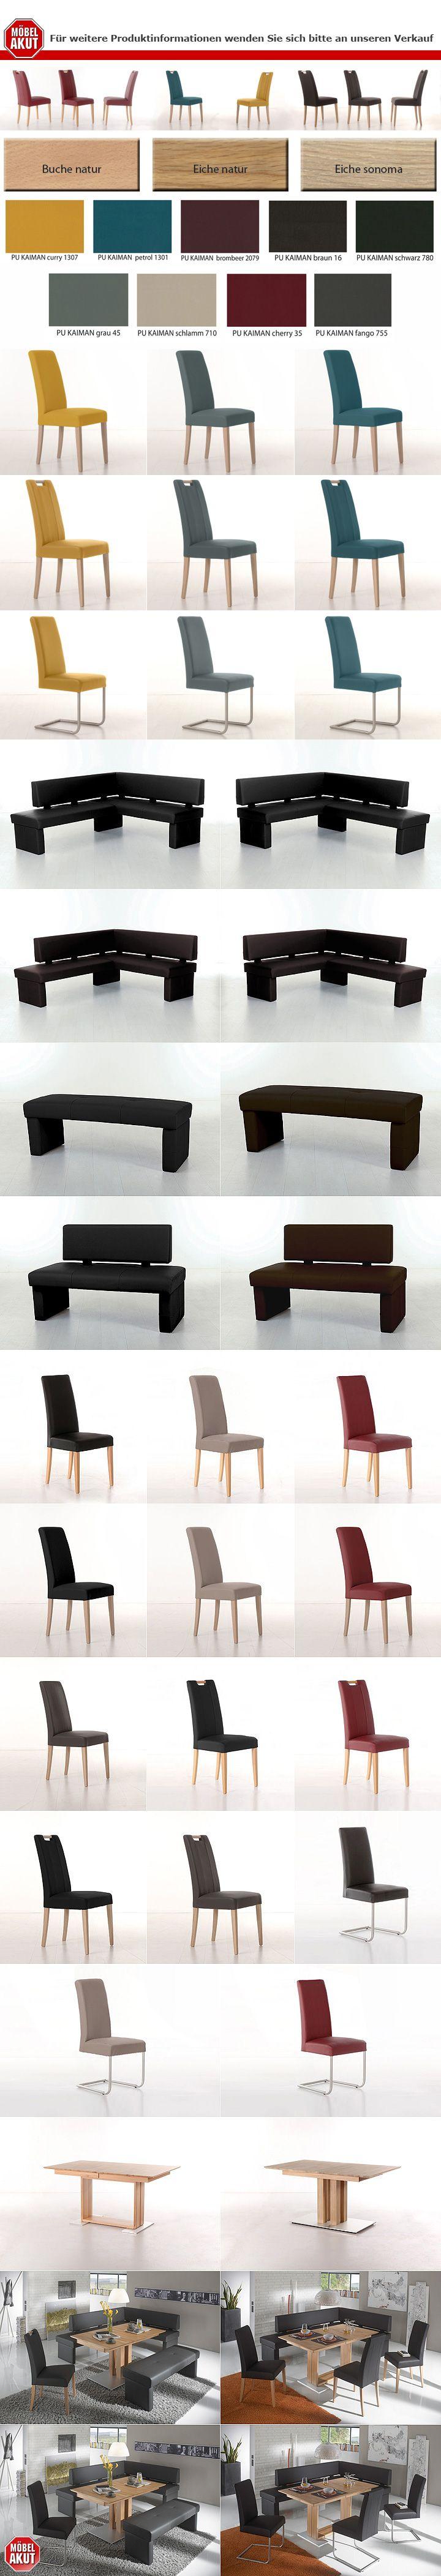 schwingstuhl samiro 3 schlamm und edelstahl. Black Bedroom Furniture Sets. Home Design Ideas